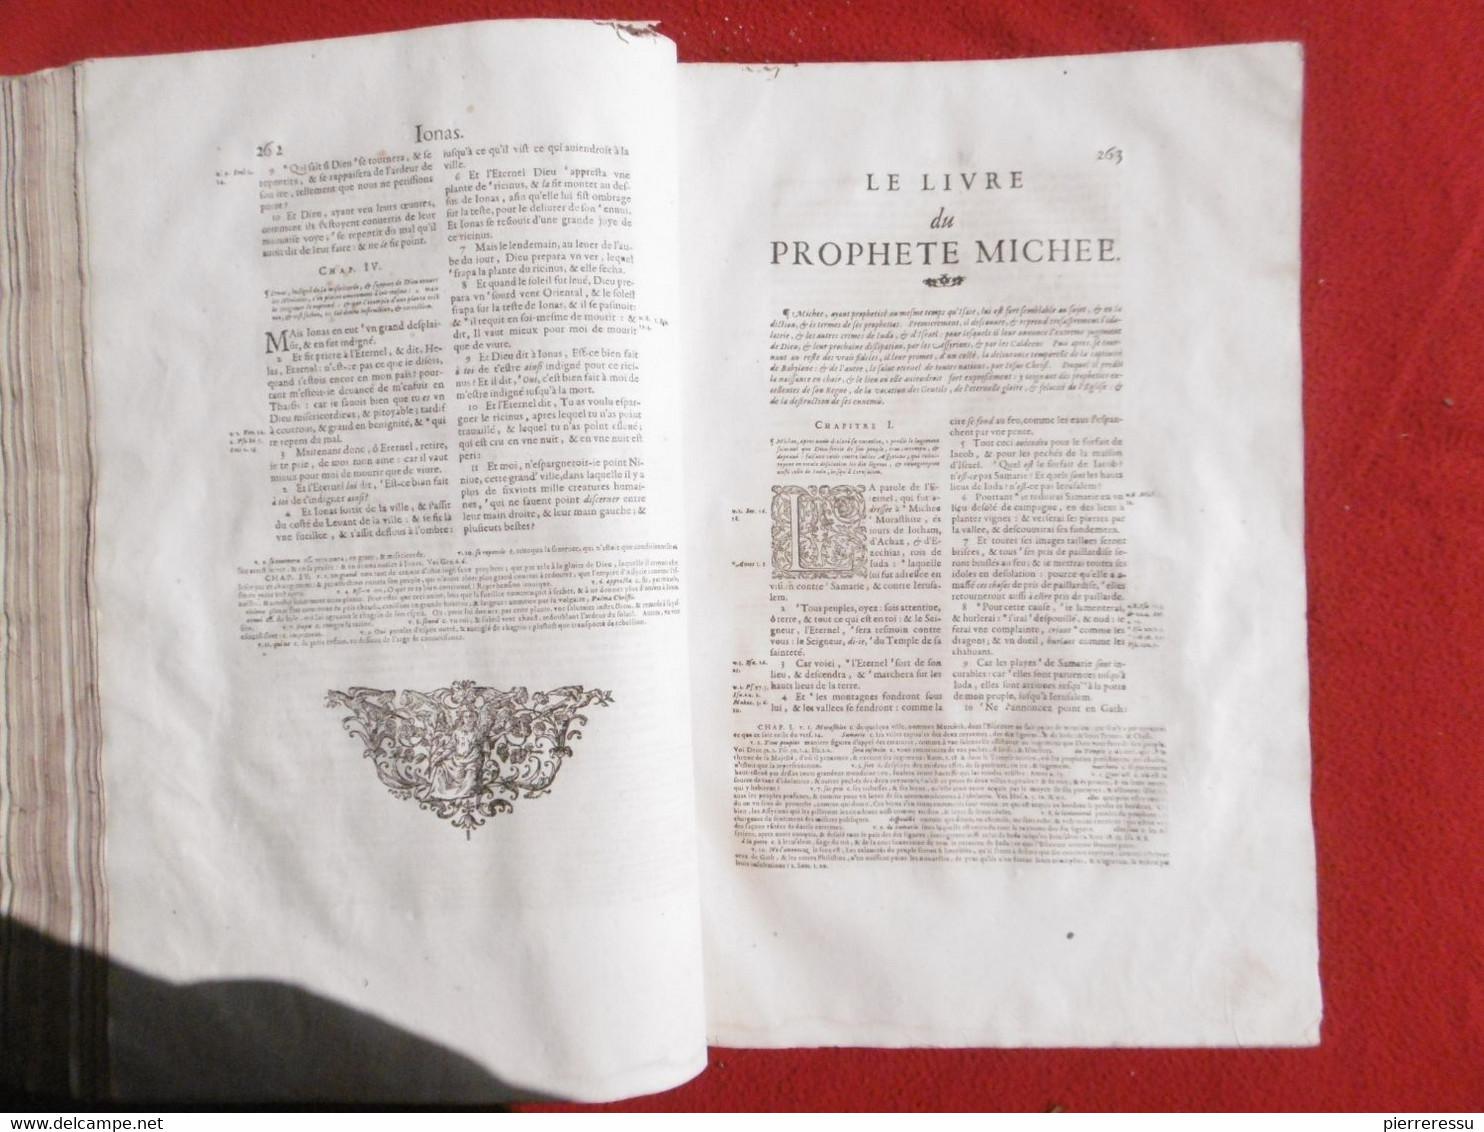 LA SAINTE BIBLE INTERPRETEE PAR JEAN DIODATI 1644 GENEVE PIERRE CHOUET RRRRRRRRRRRR - Bibbia, Cristianesimo